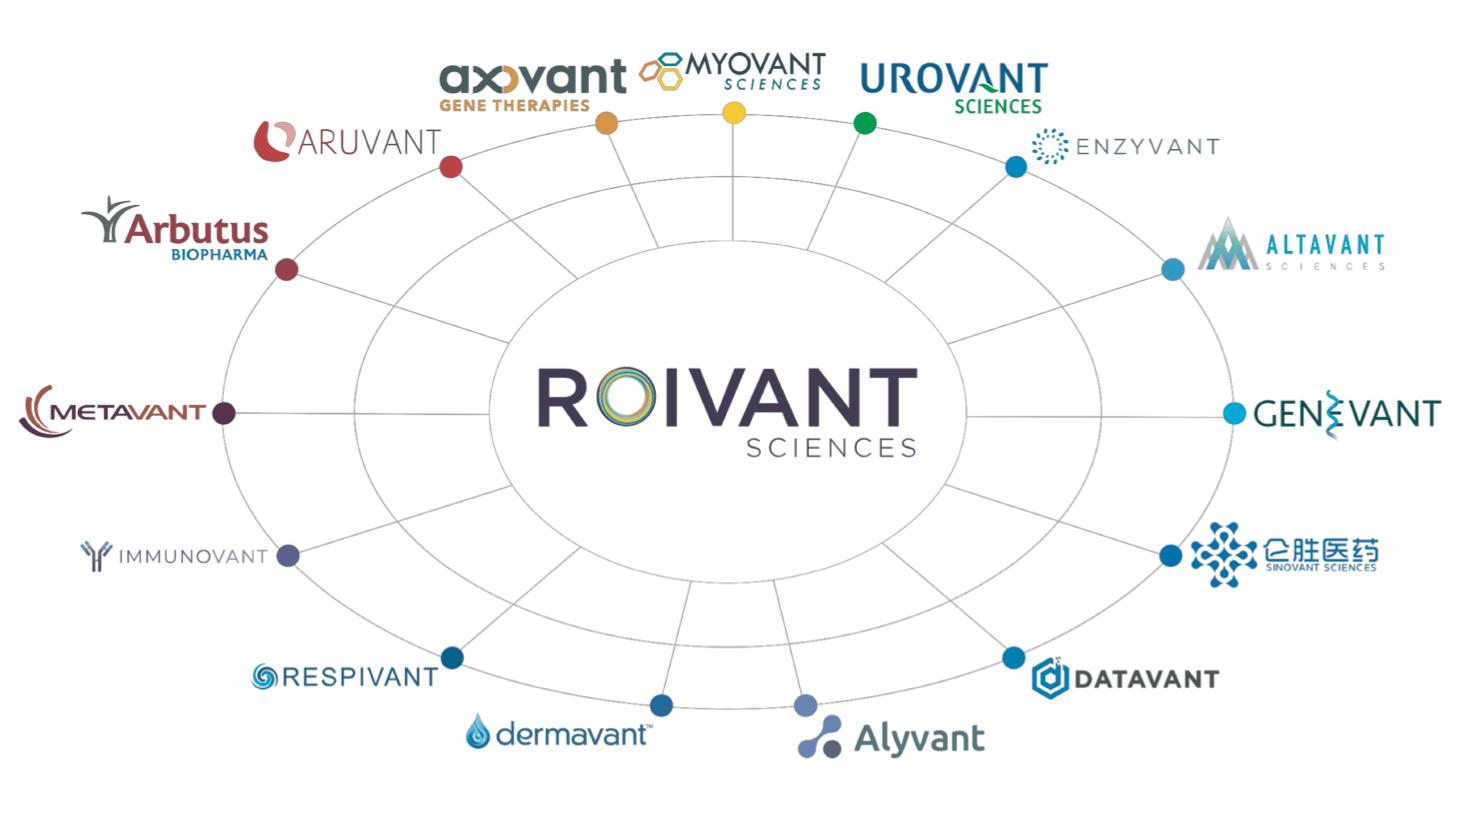 Roivant Family Companies